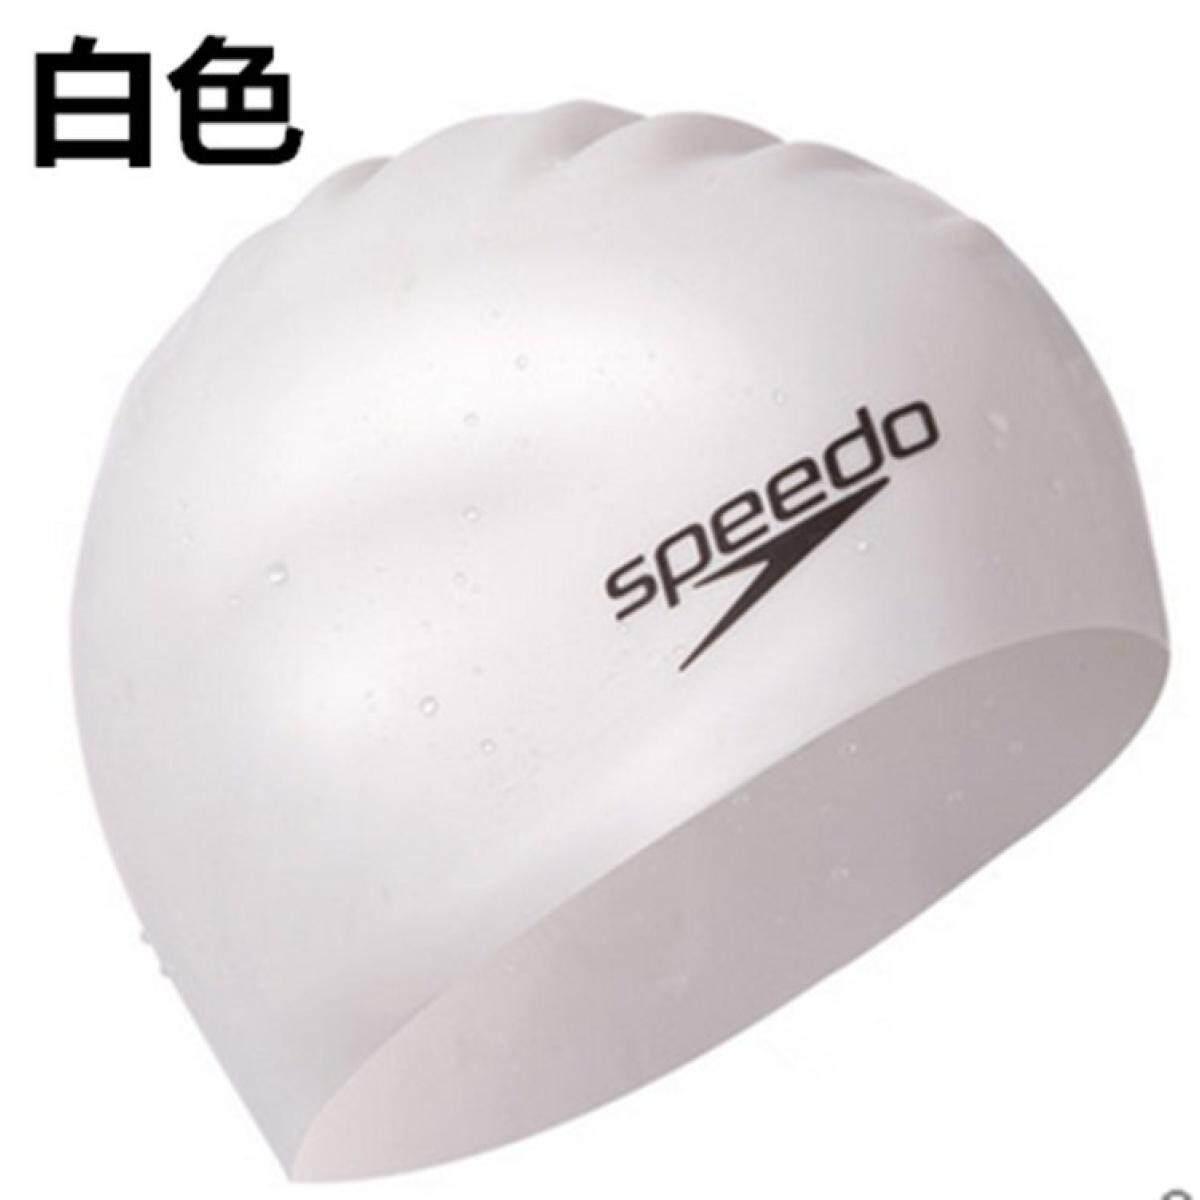 Speedo Plain Flat Silicone Cap 100% Silica Gel Swimming Hood Caps For Adult Men Or Women - intl